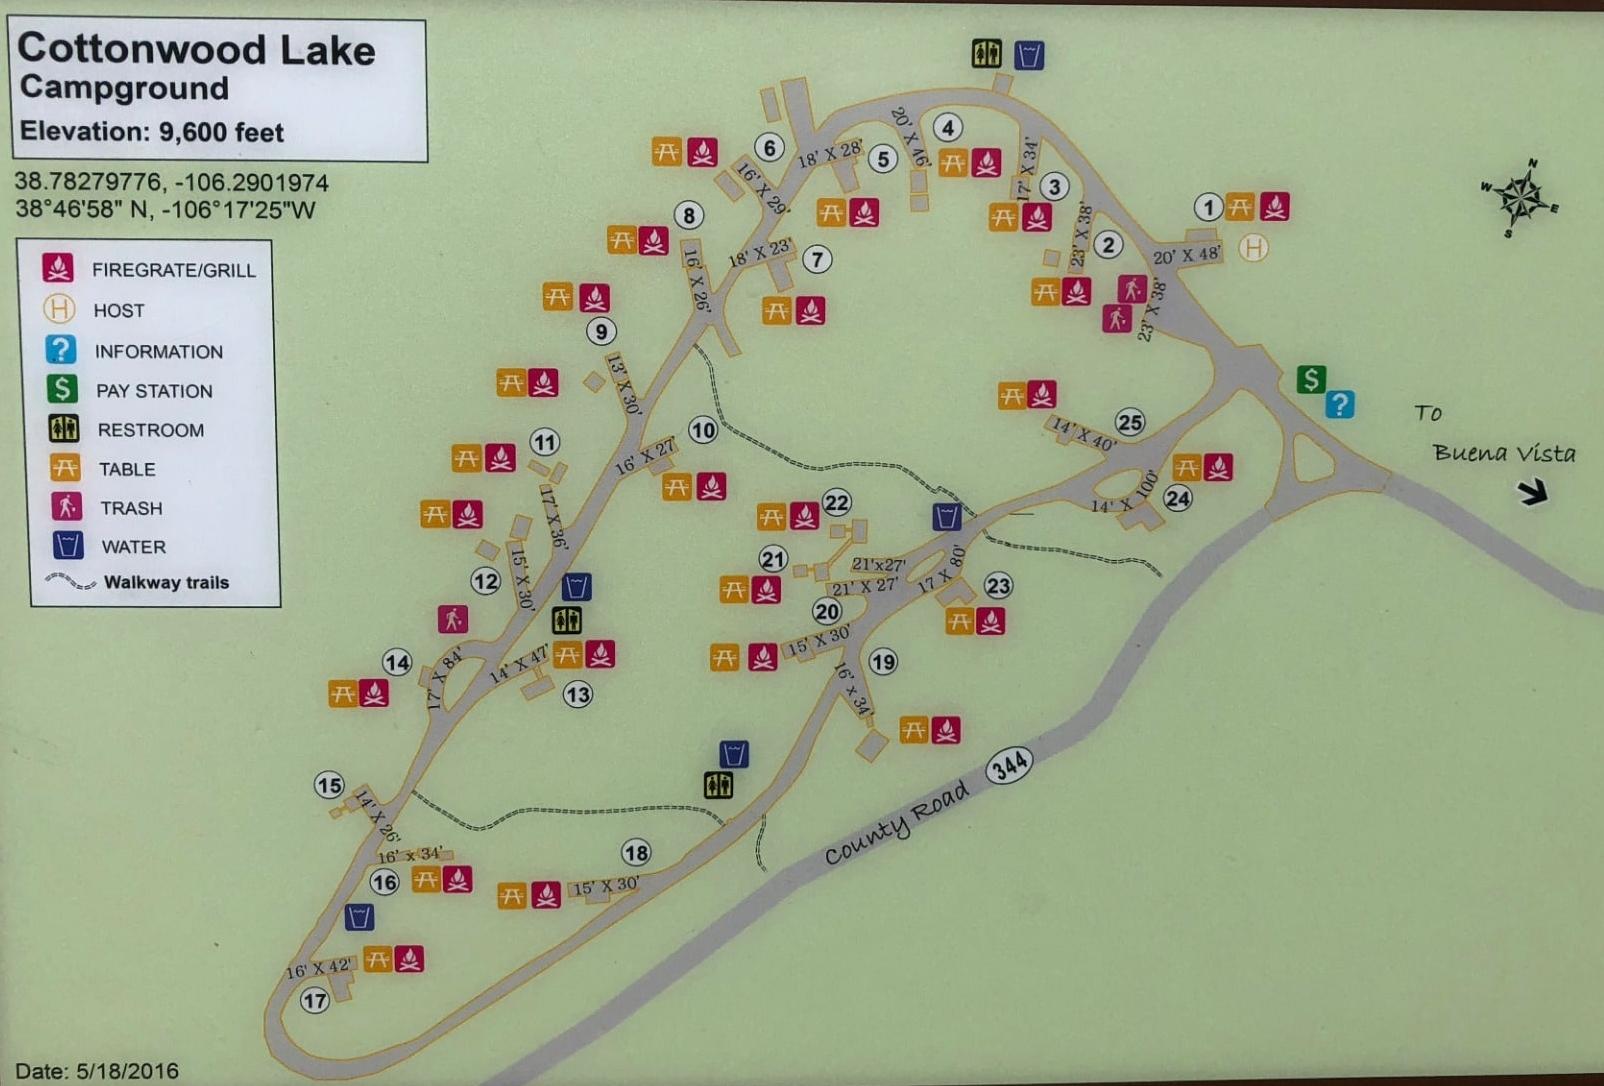 Cottonwood lake campground map